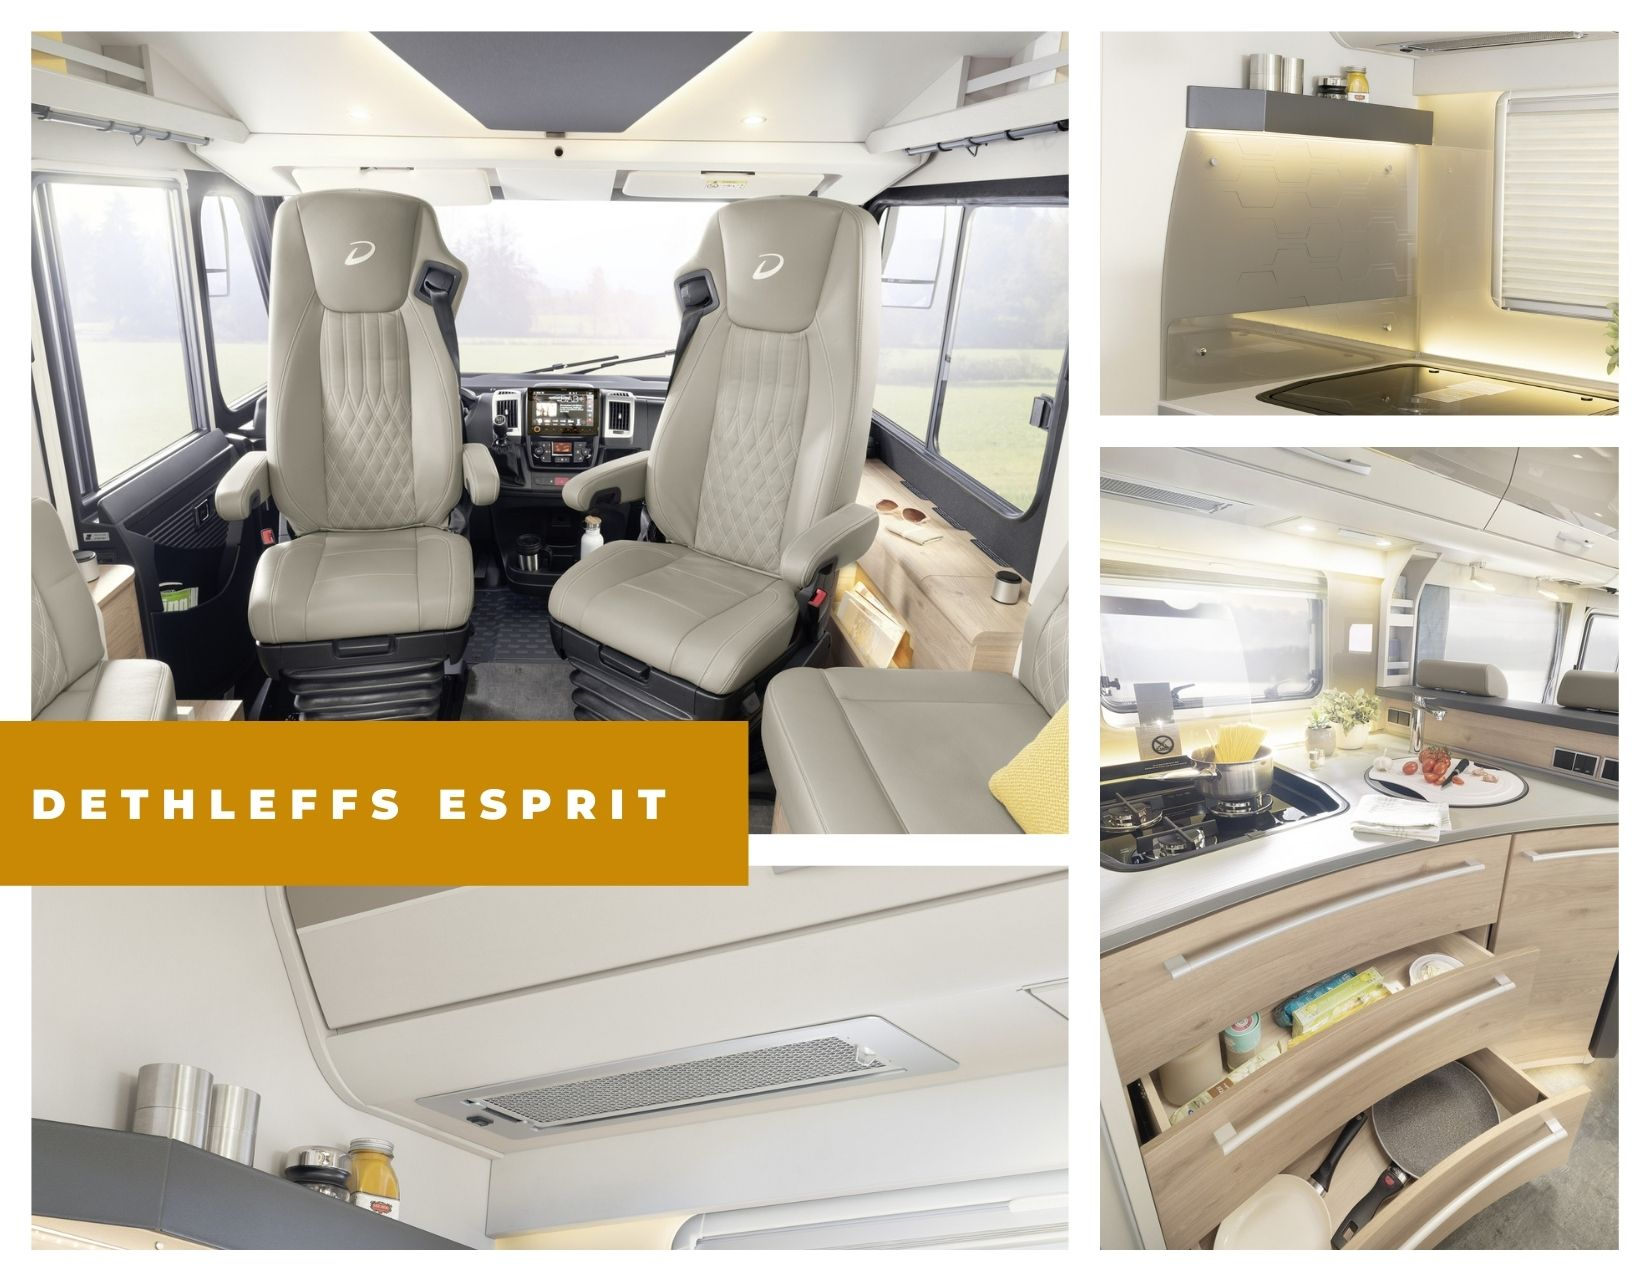 Dethleffs Esprit interior